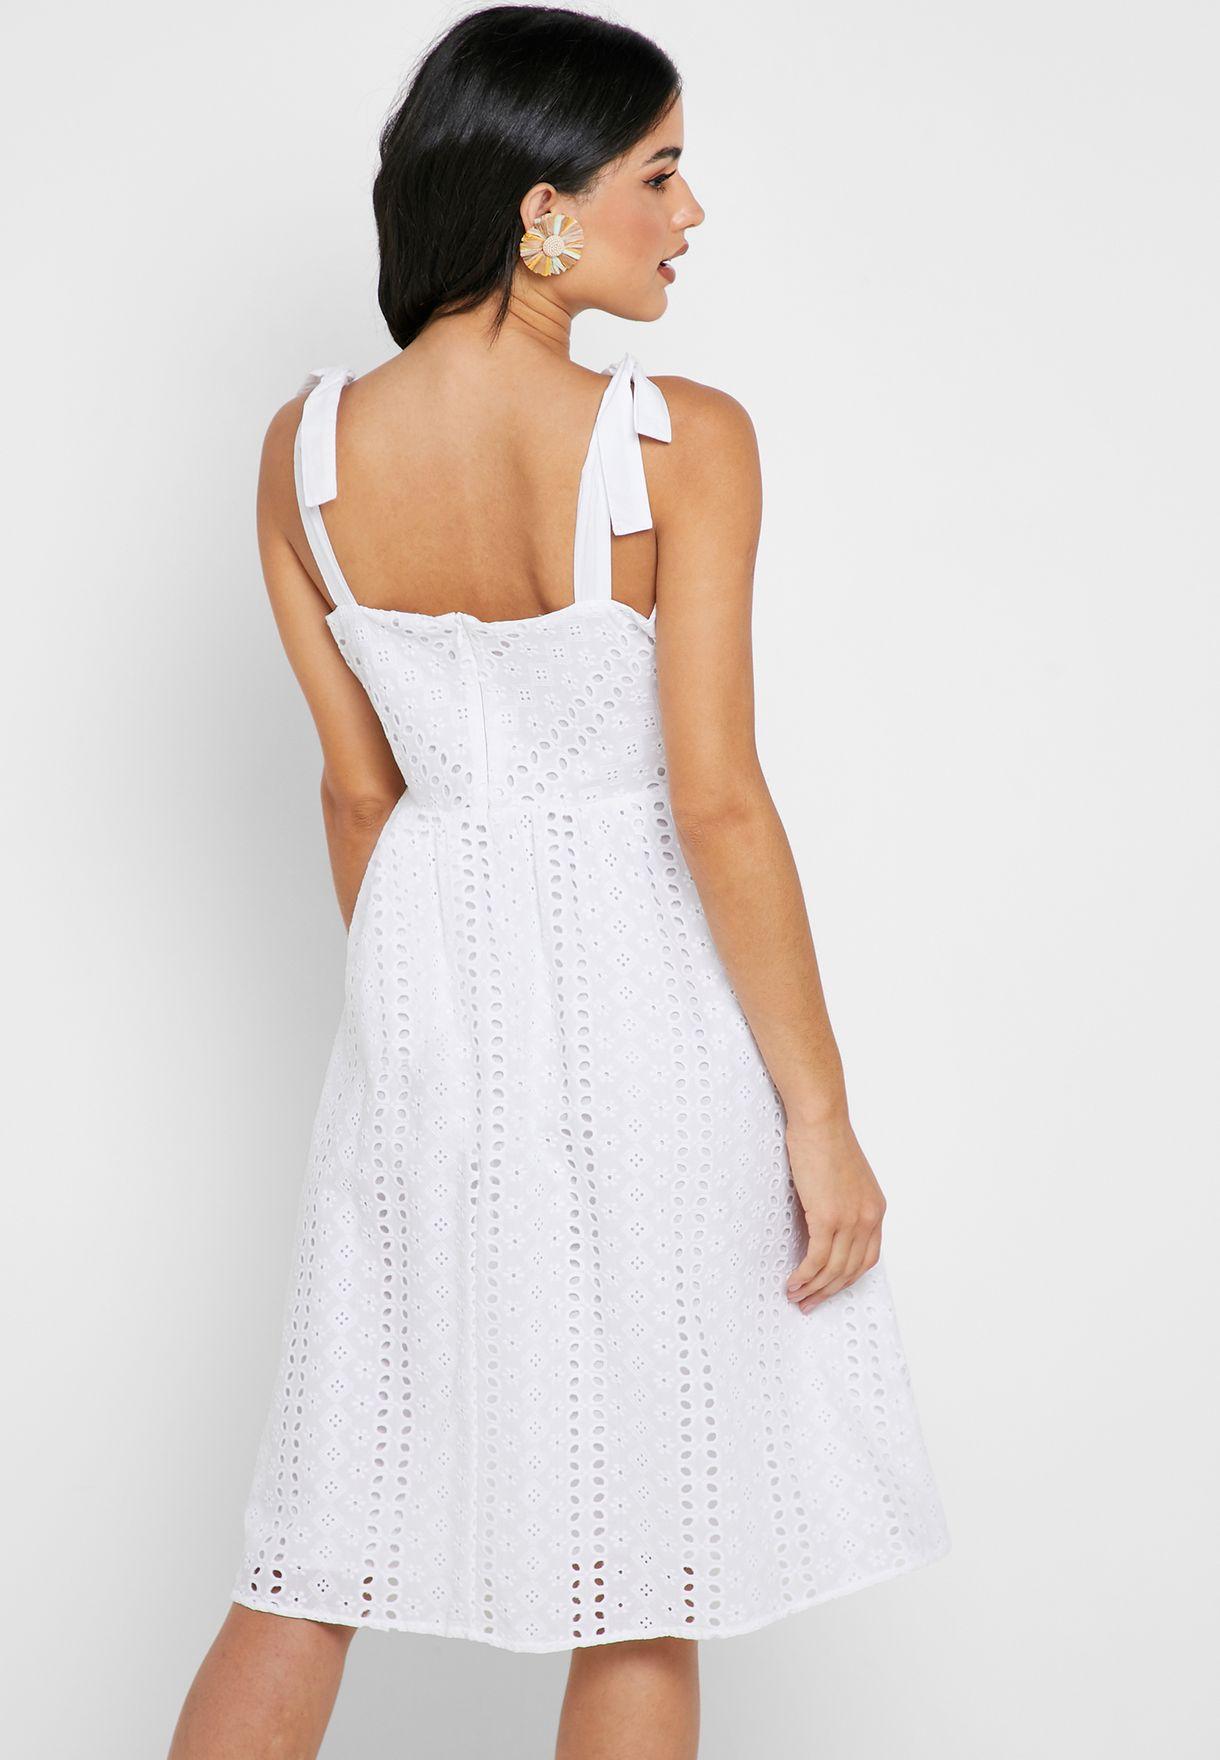 Tie Shoulder Broderie Dress